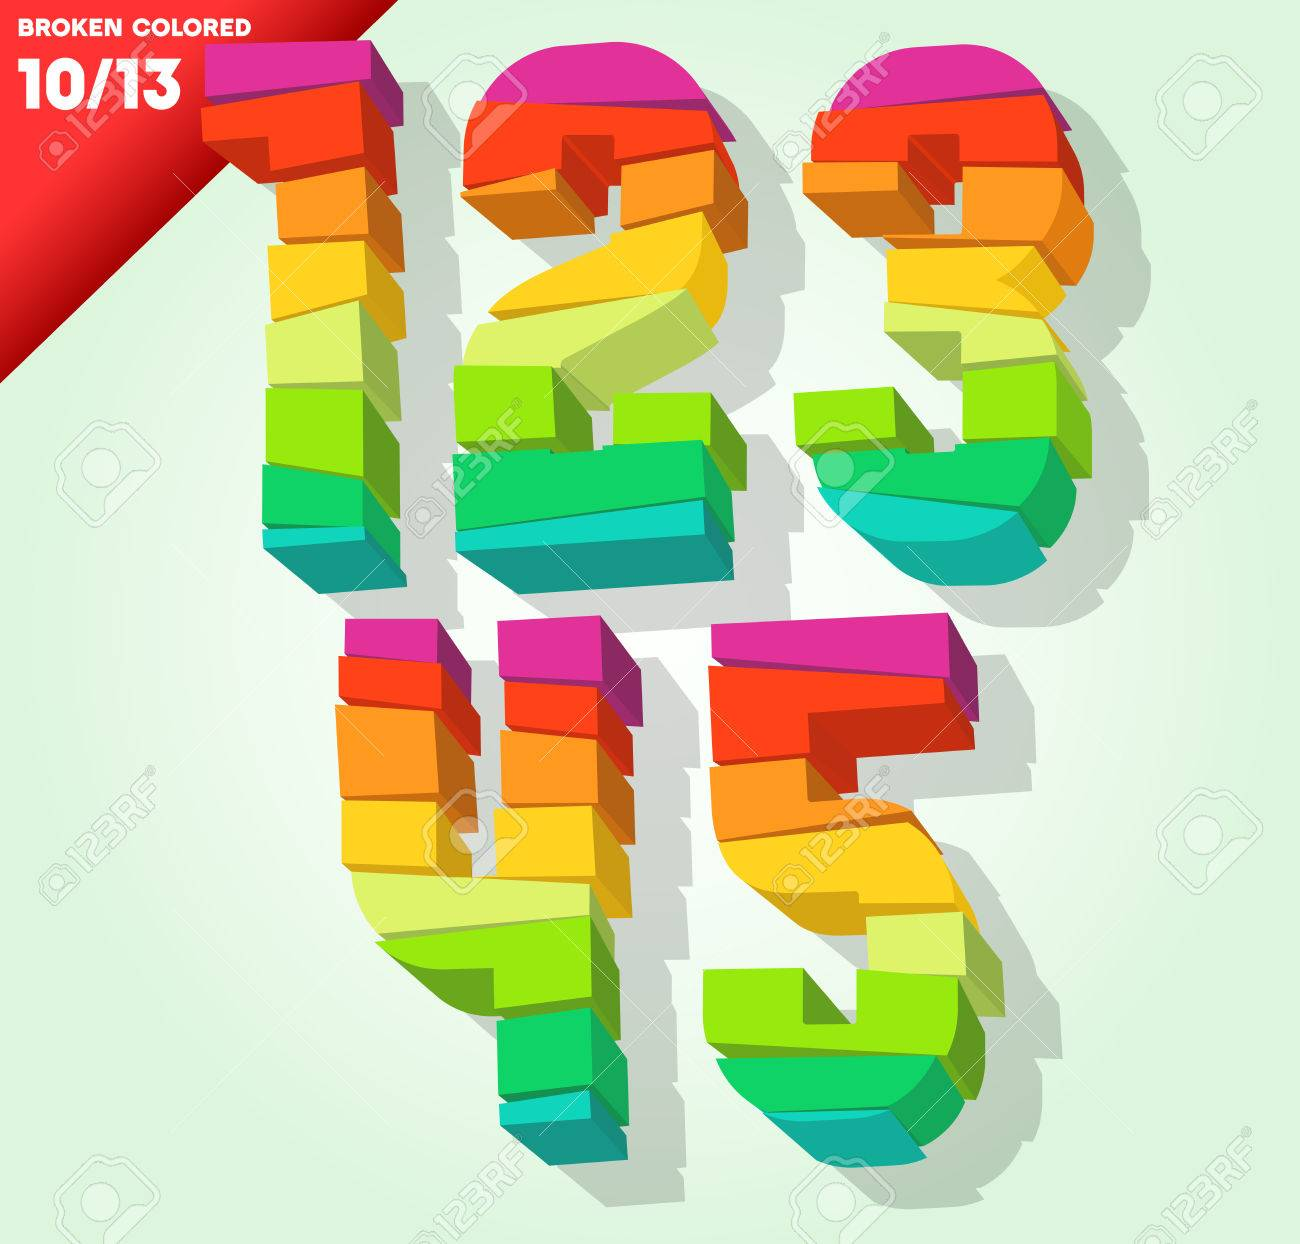 Broken colorful alphabet vector illustration symbols 1 2 3 4 broken colorful alphabet vector illustration symbols 1 2 3 4 5 stock vector 24242657 biocorpaavc Images